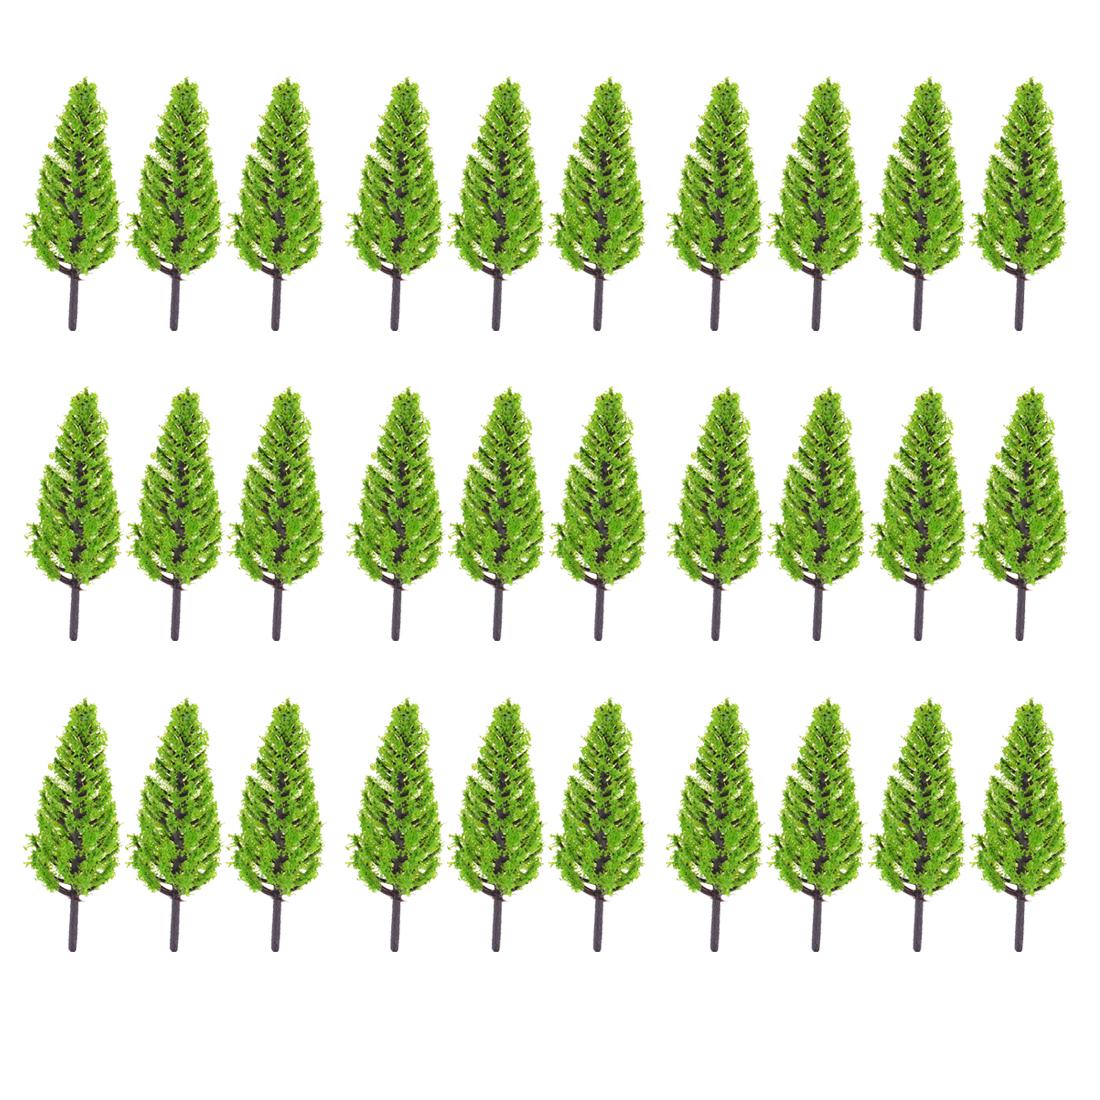 30 Pcs Light Green Plastic Pagoda Model Trees Layout Scene 7.5cm High Scale 1:200